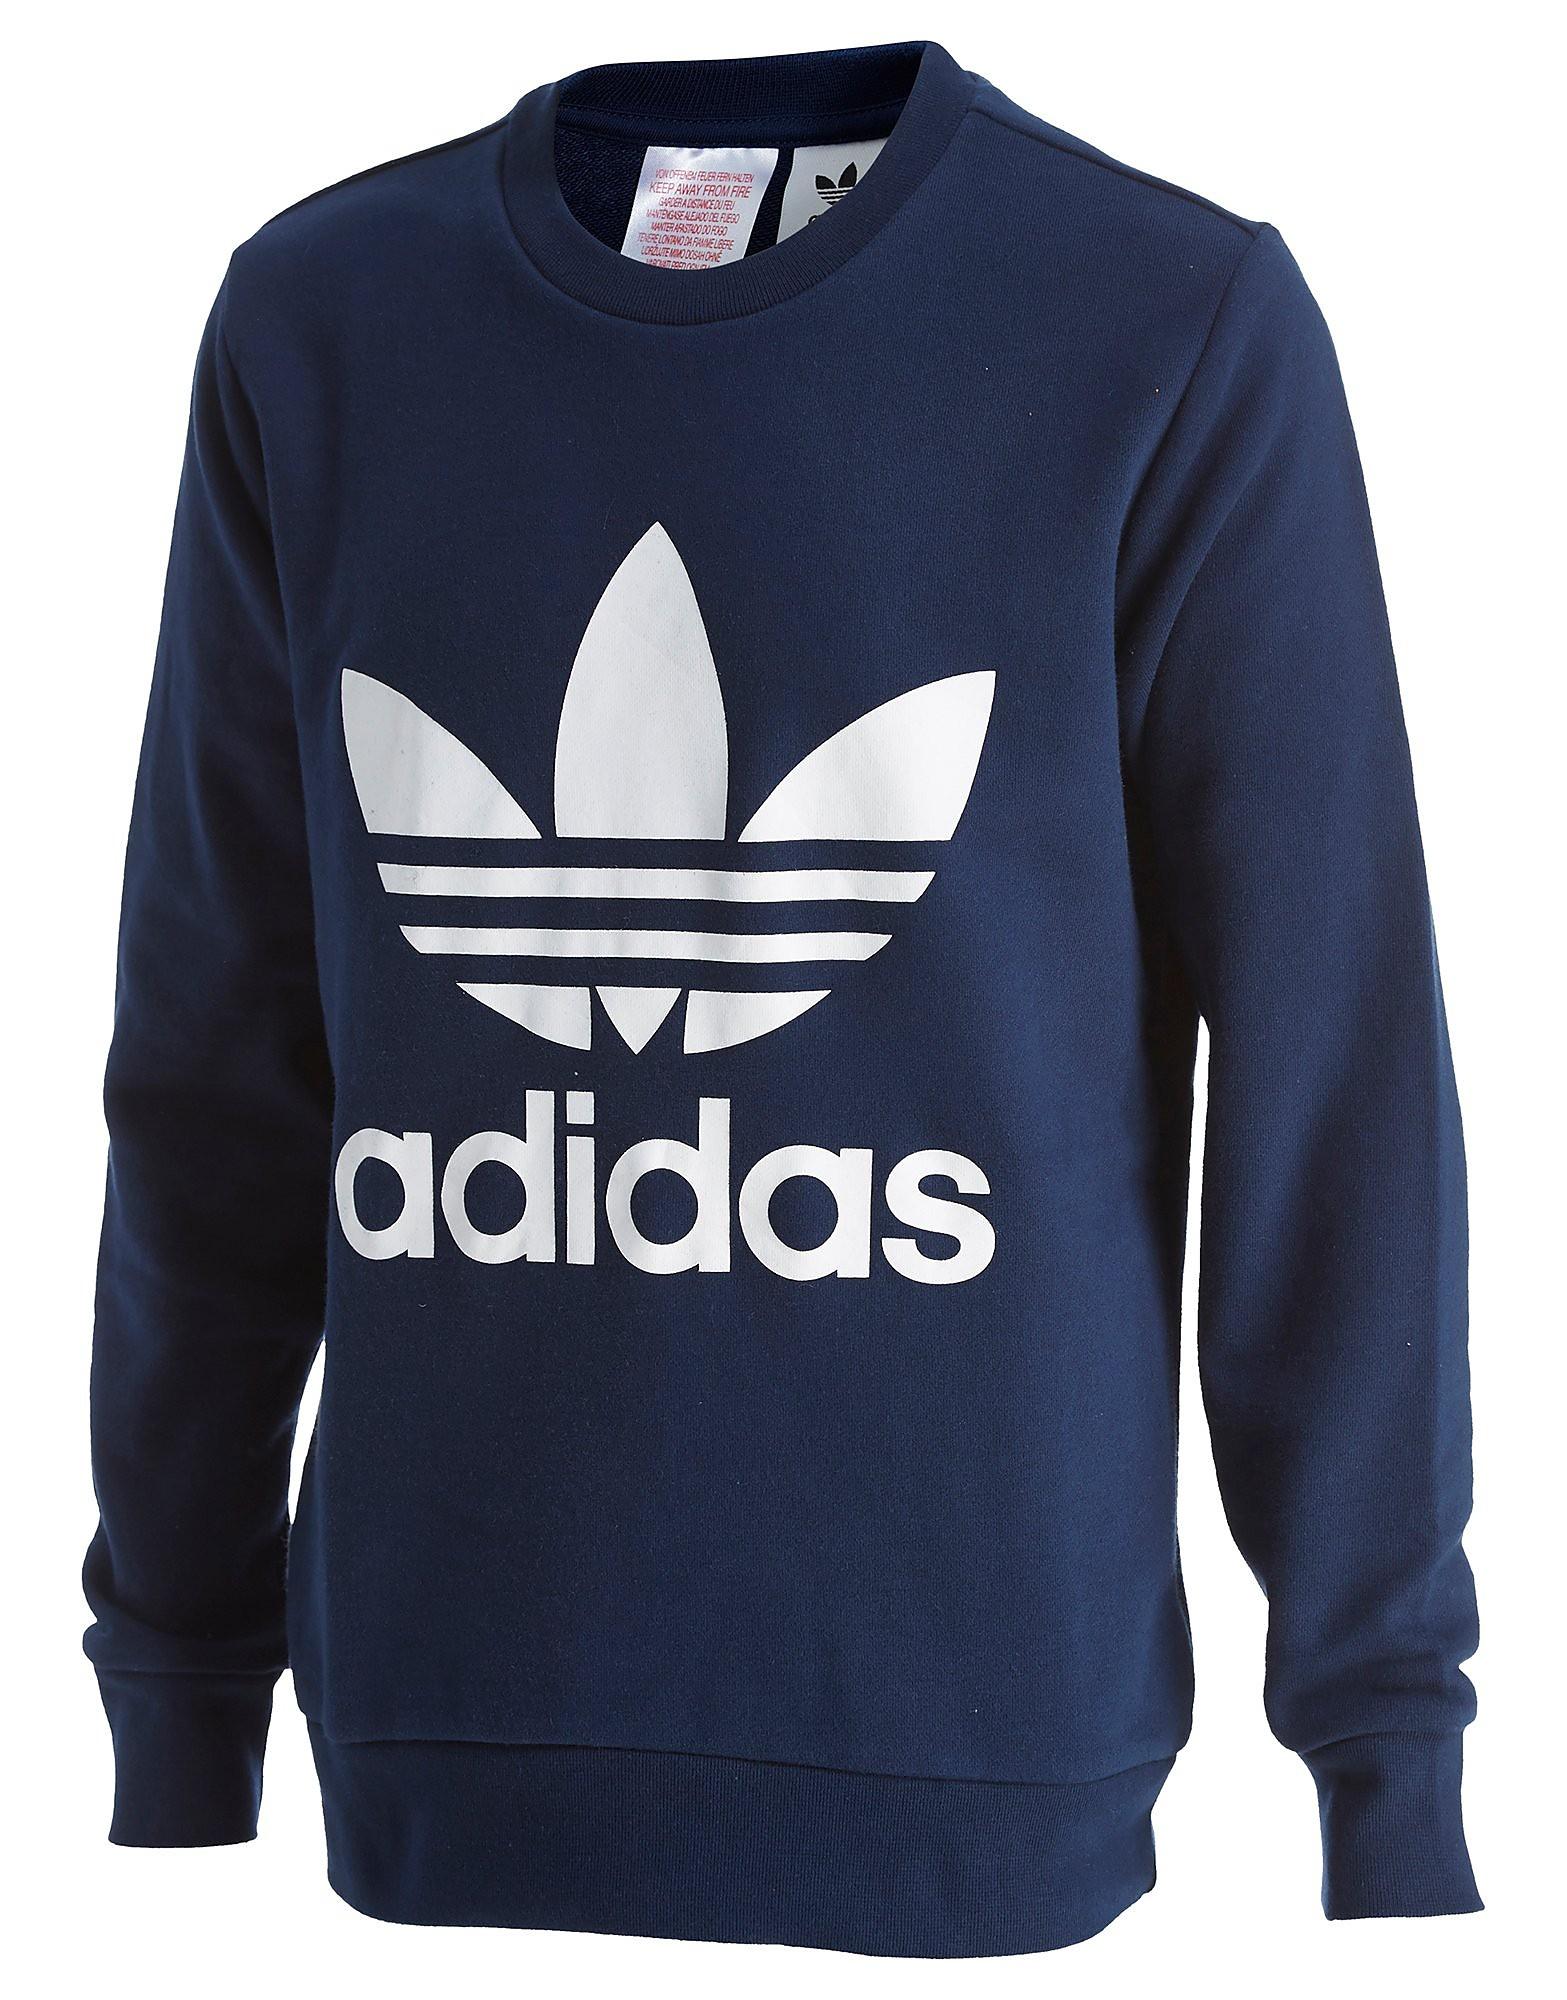 adidas Originals Adicolor Crew Sweatshirt Junior